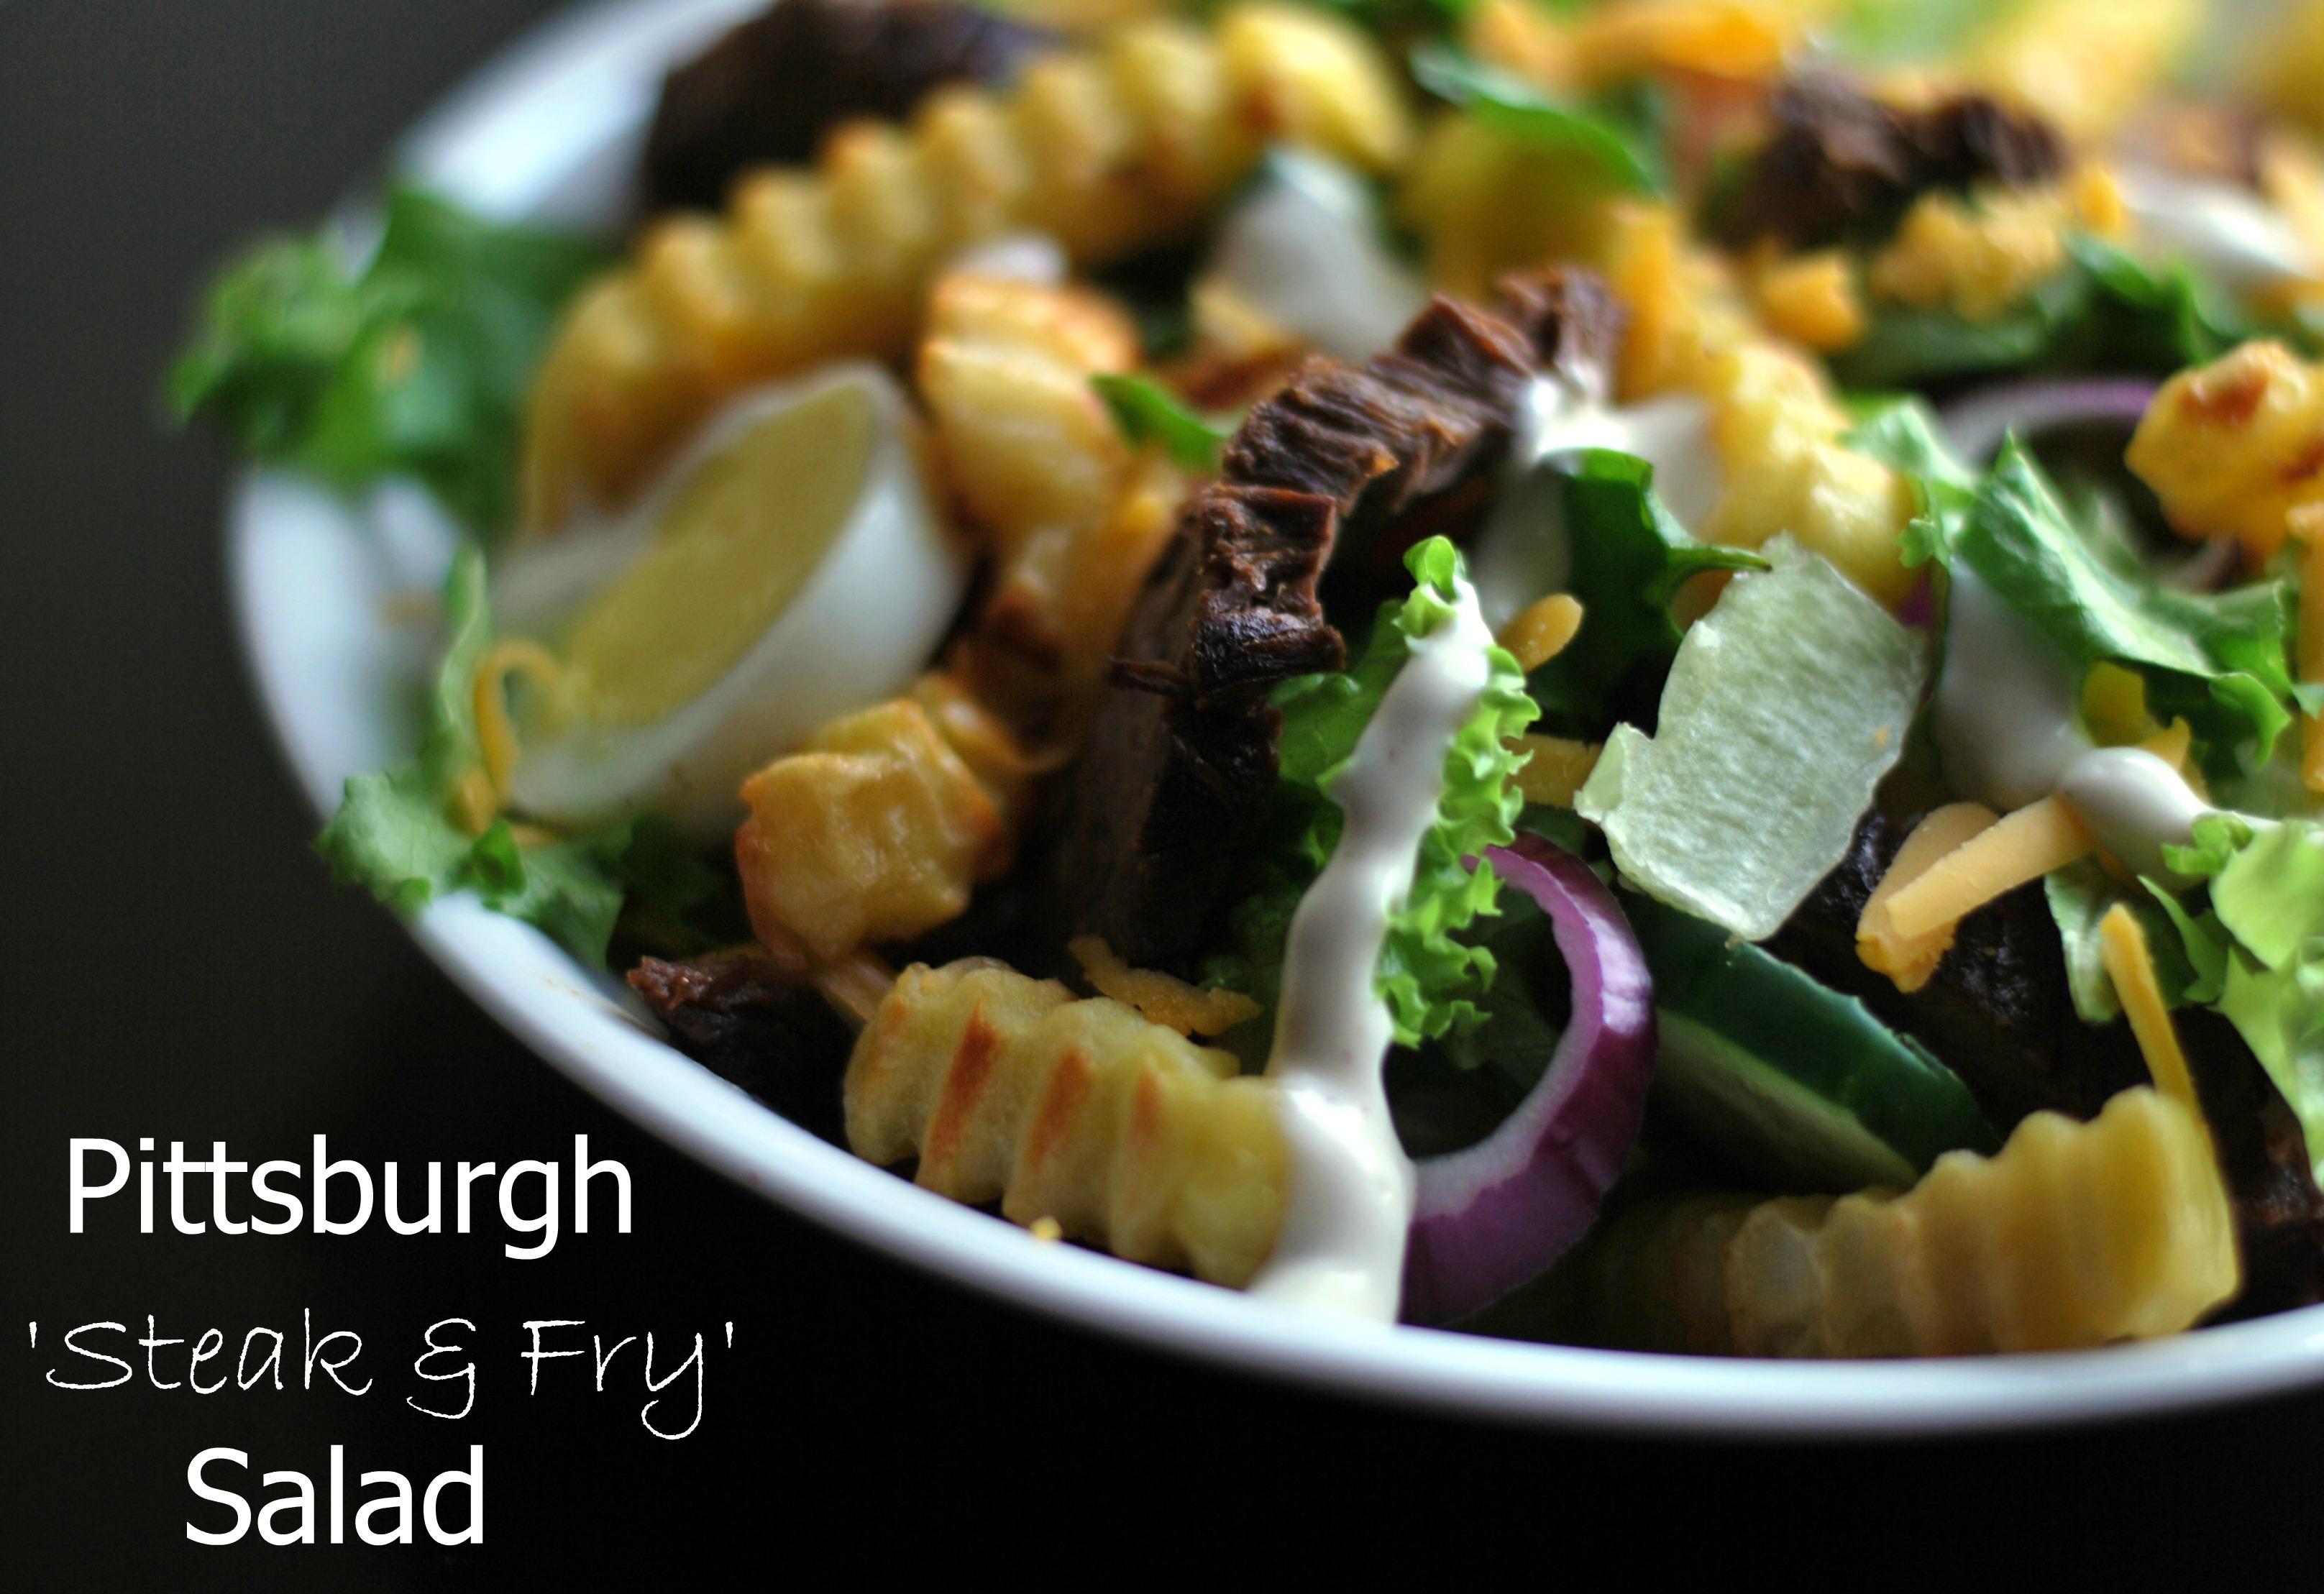 Pittsburgh 'Steak & Fry' Salad